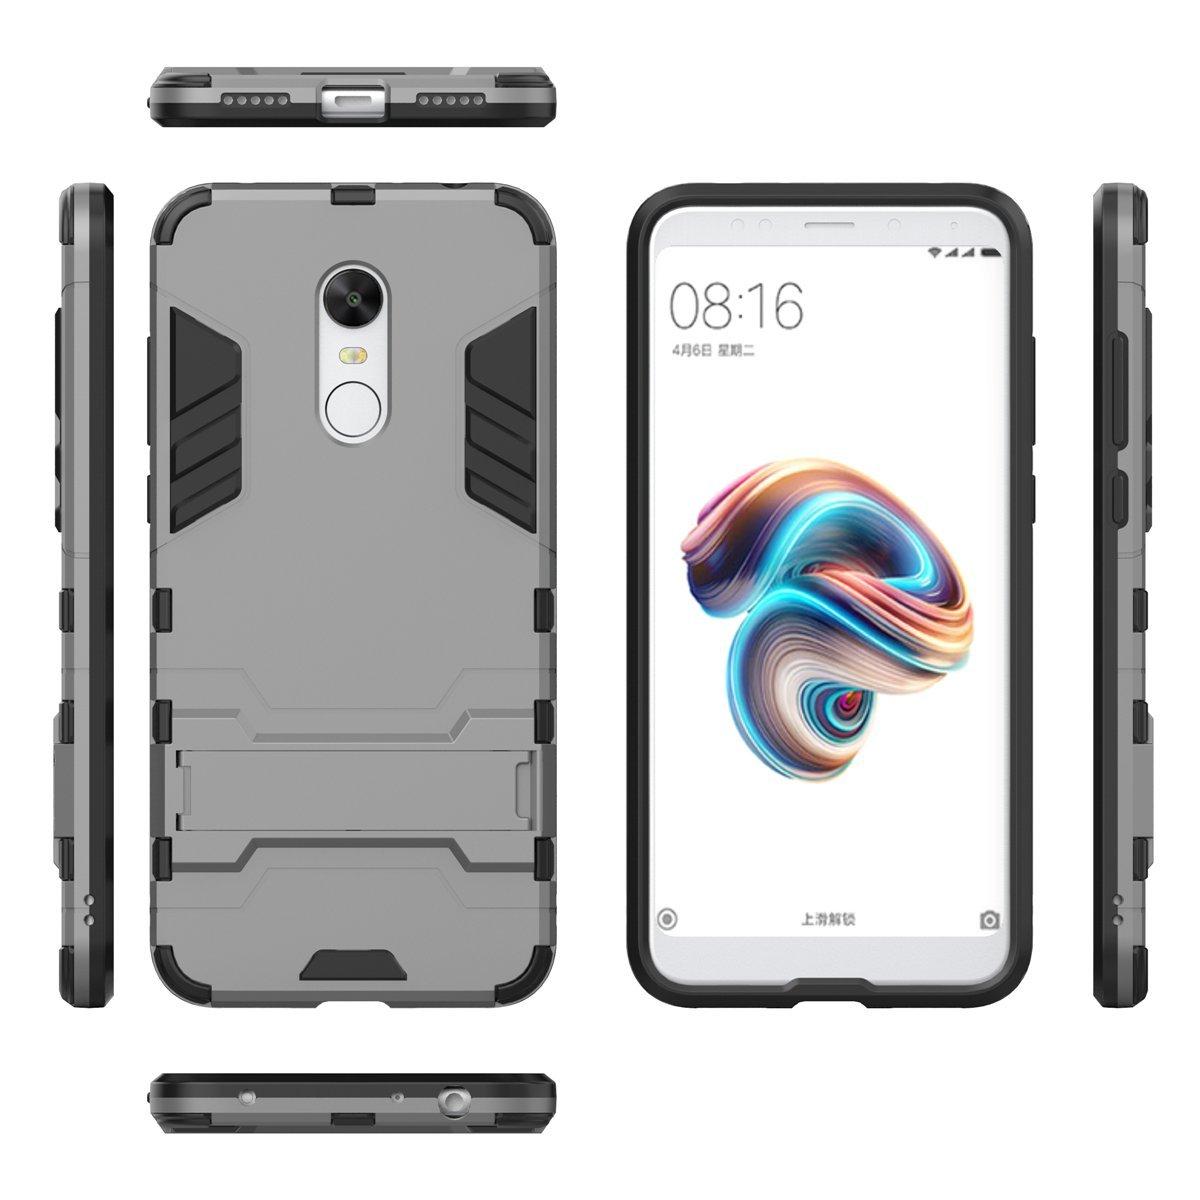 Xiaomi Redmi 5 Plus Funda Anti-Gota Anti-Choques R/ígido Carcasas para Xiaomi Redmi 5 Plus adorehouse Hybrid TPU y PC Bumper Back Cover dise/ño 2 en 1 Plata